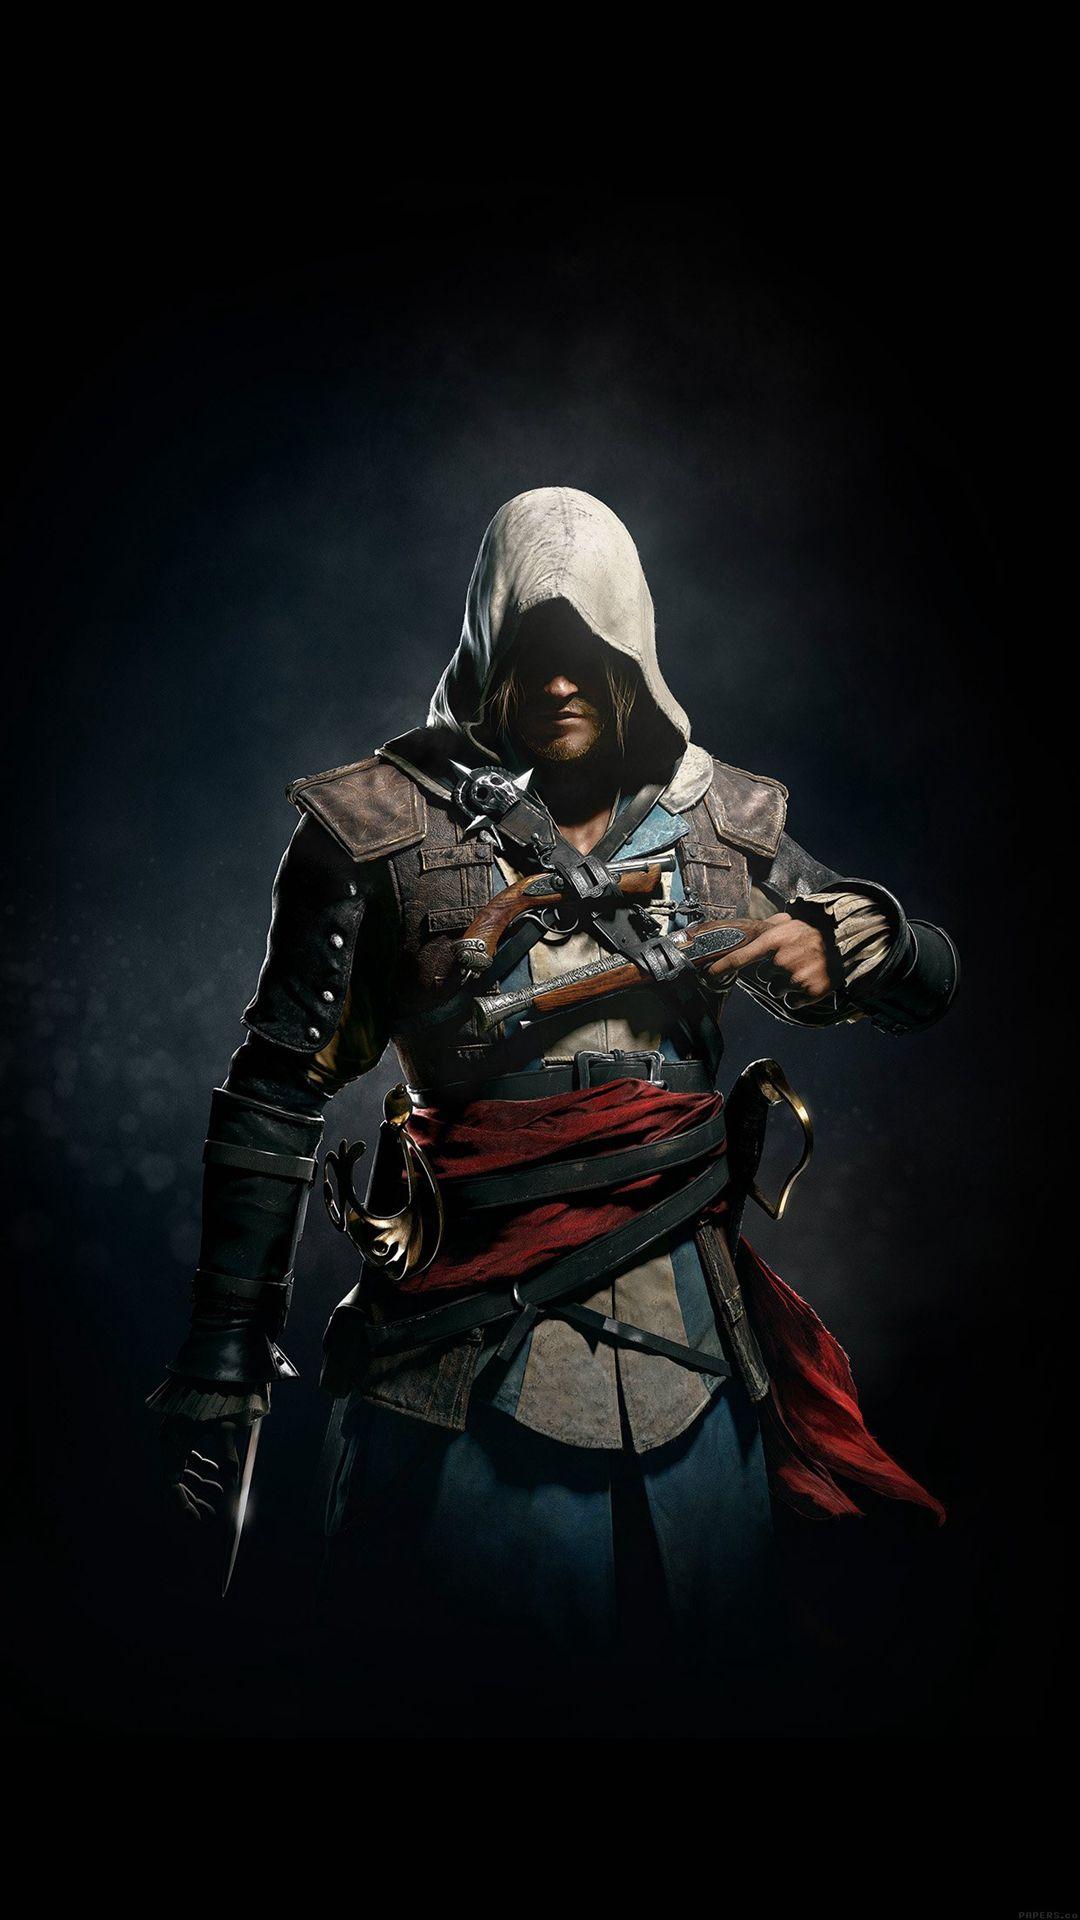 Assassins Creed 4 Dark Game Art Illust Iphone 6 Plus Wallpaper